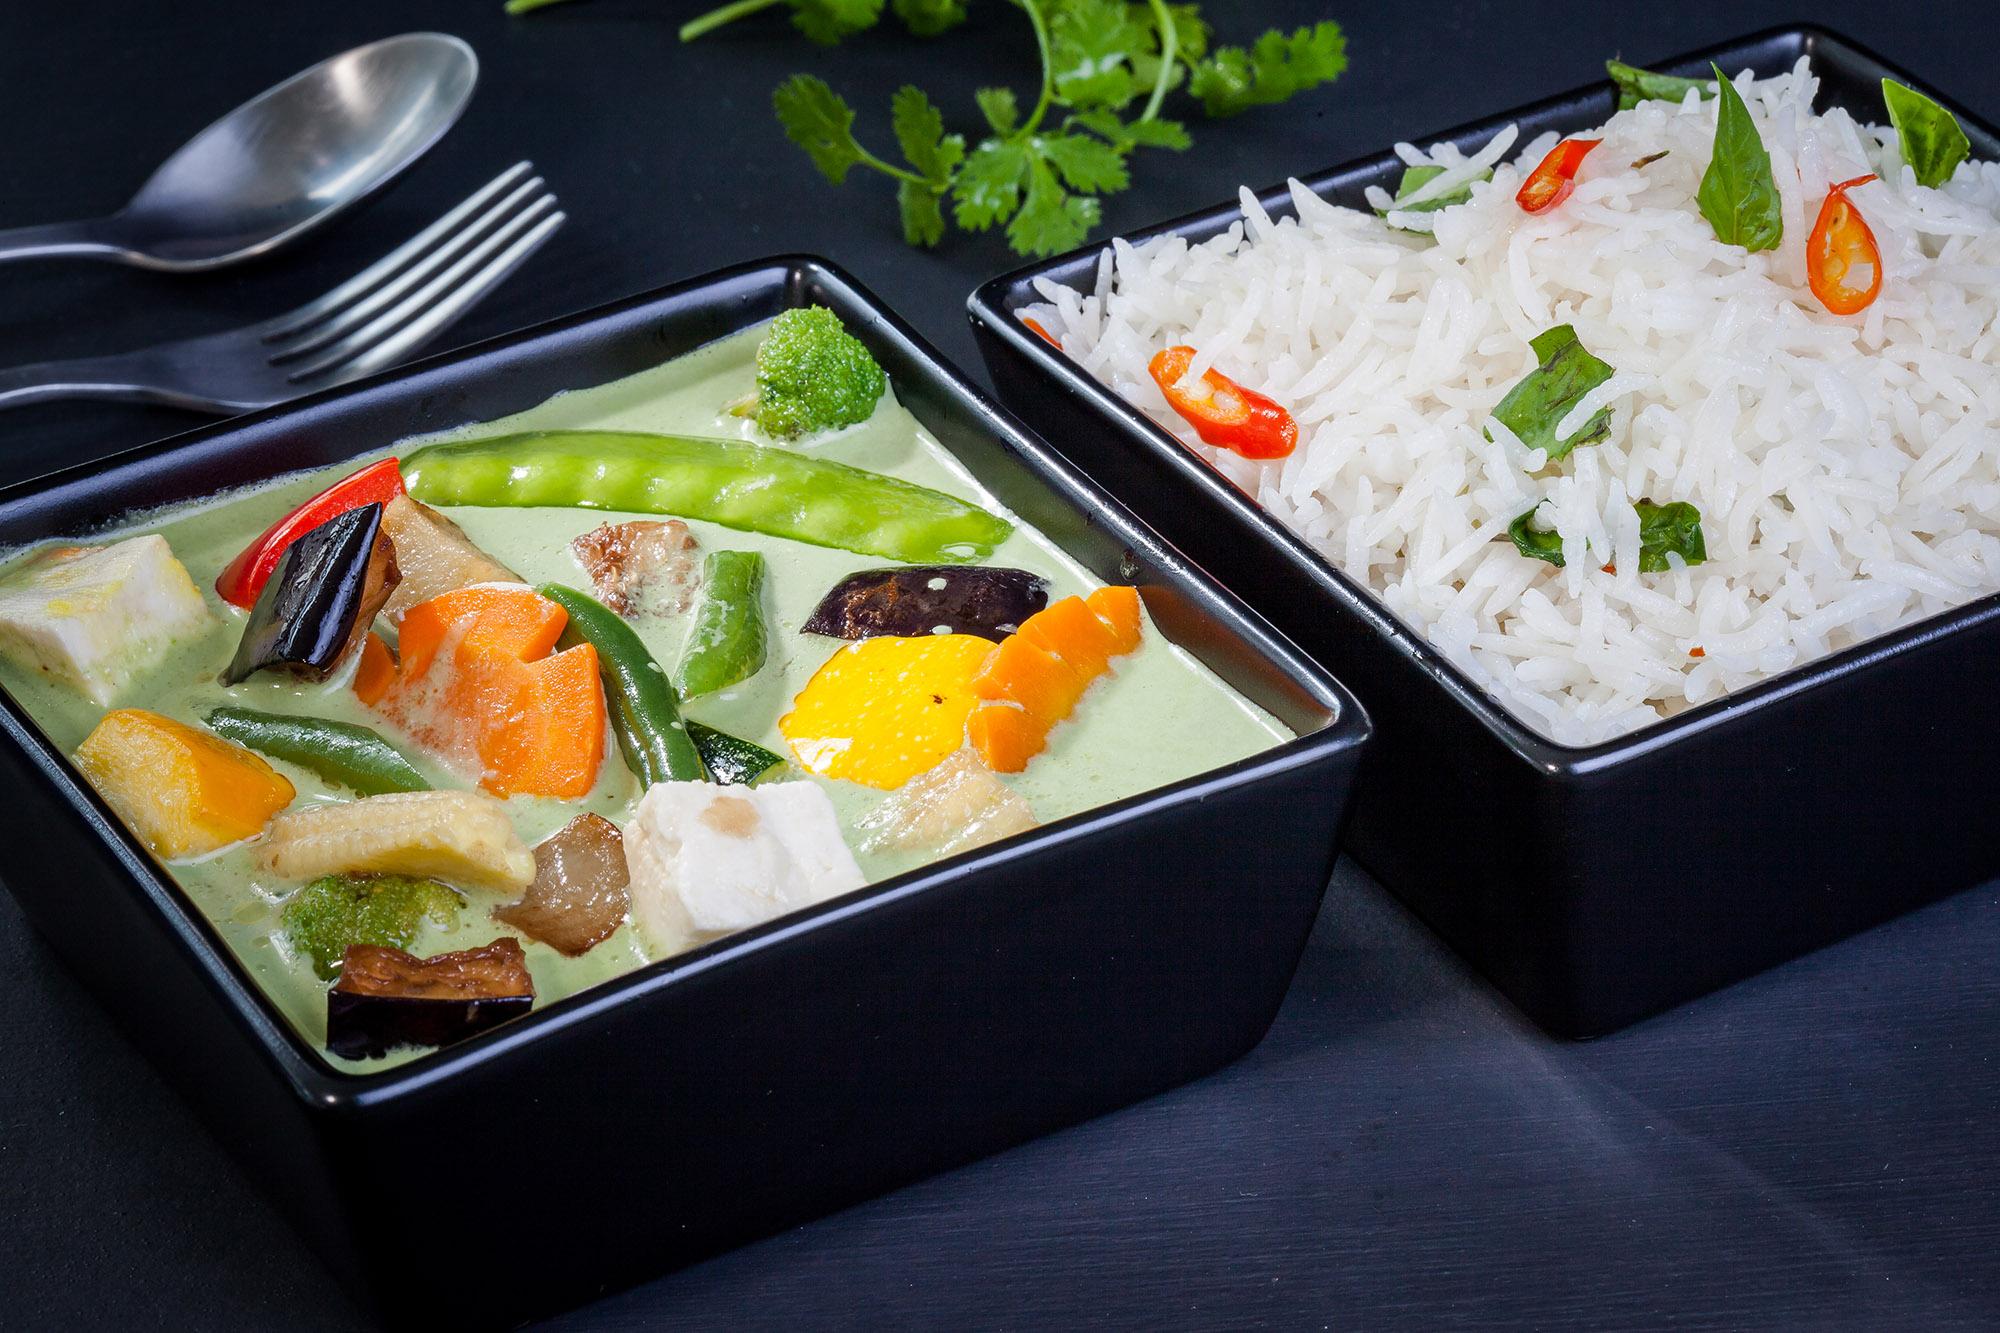 _17FM09512_Thai Green Curry with Steamed Rice(Veg).jpg